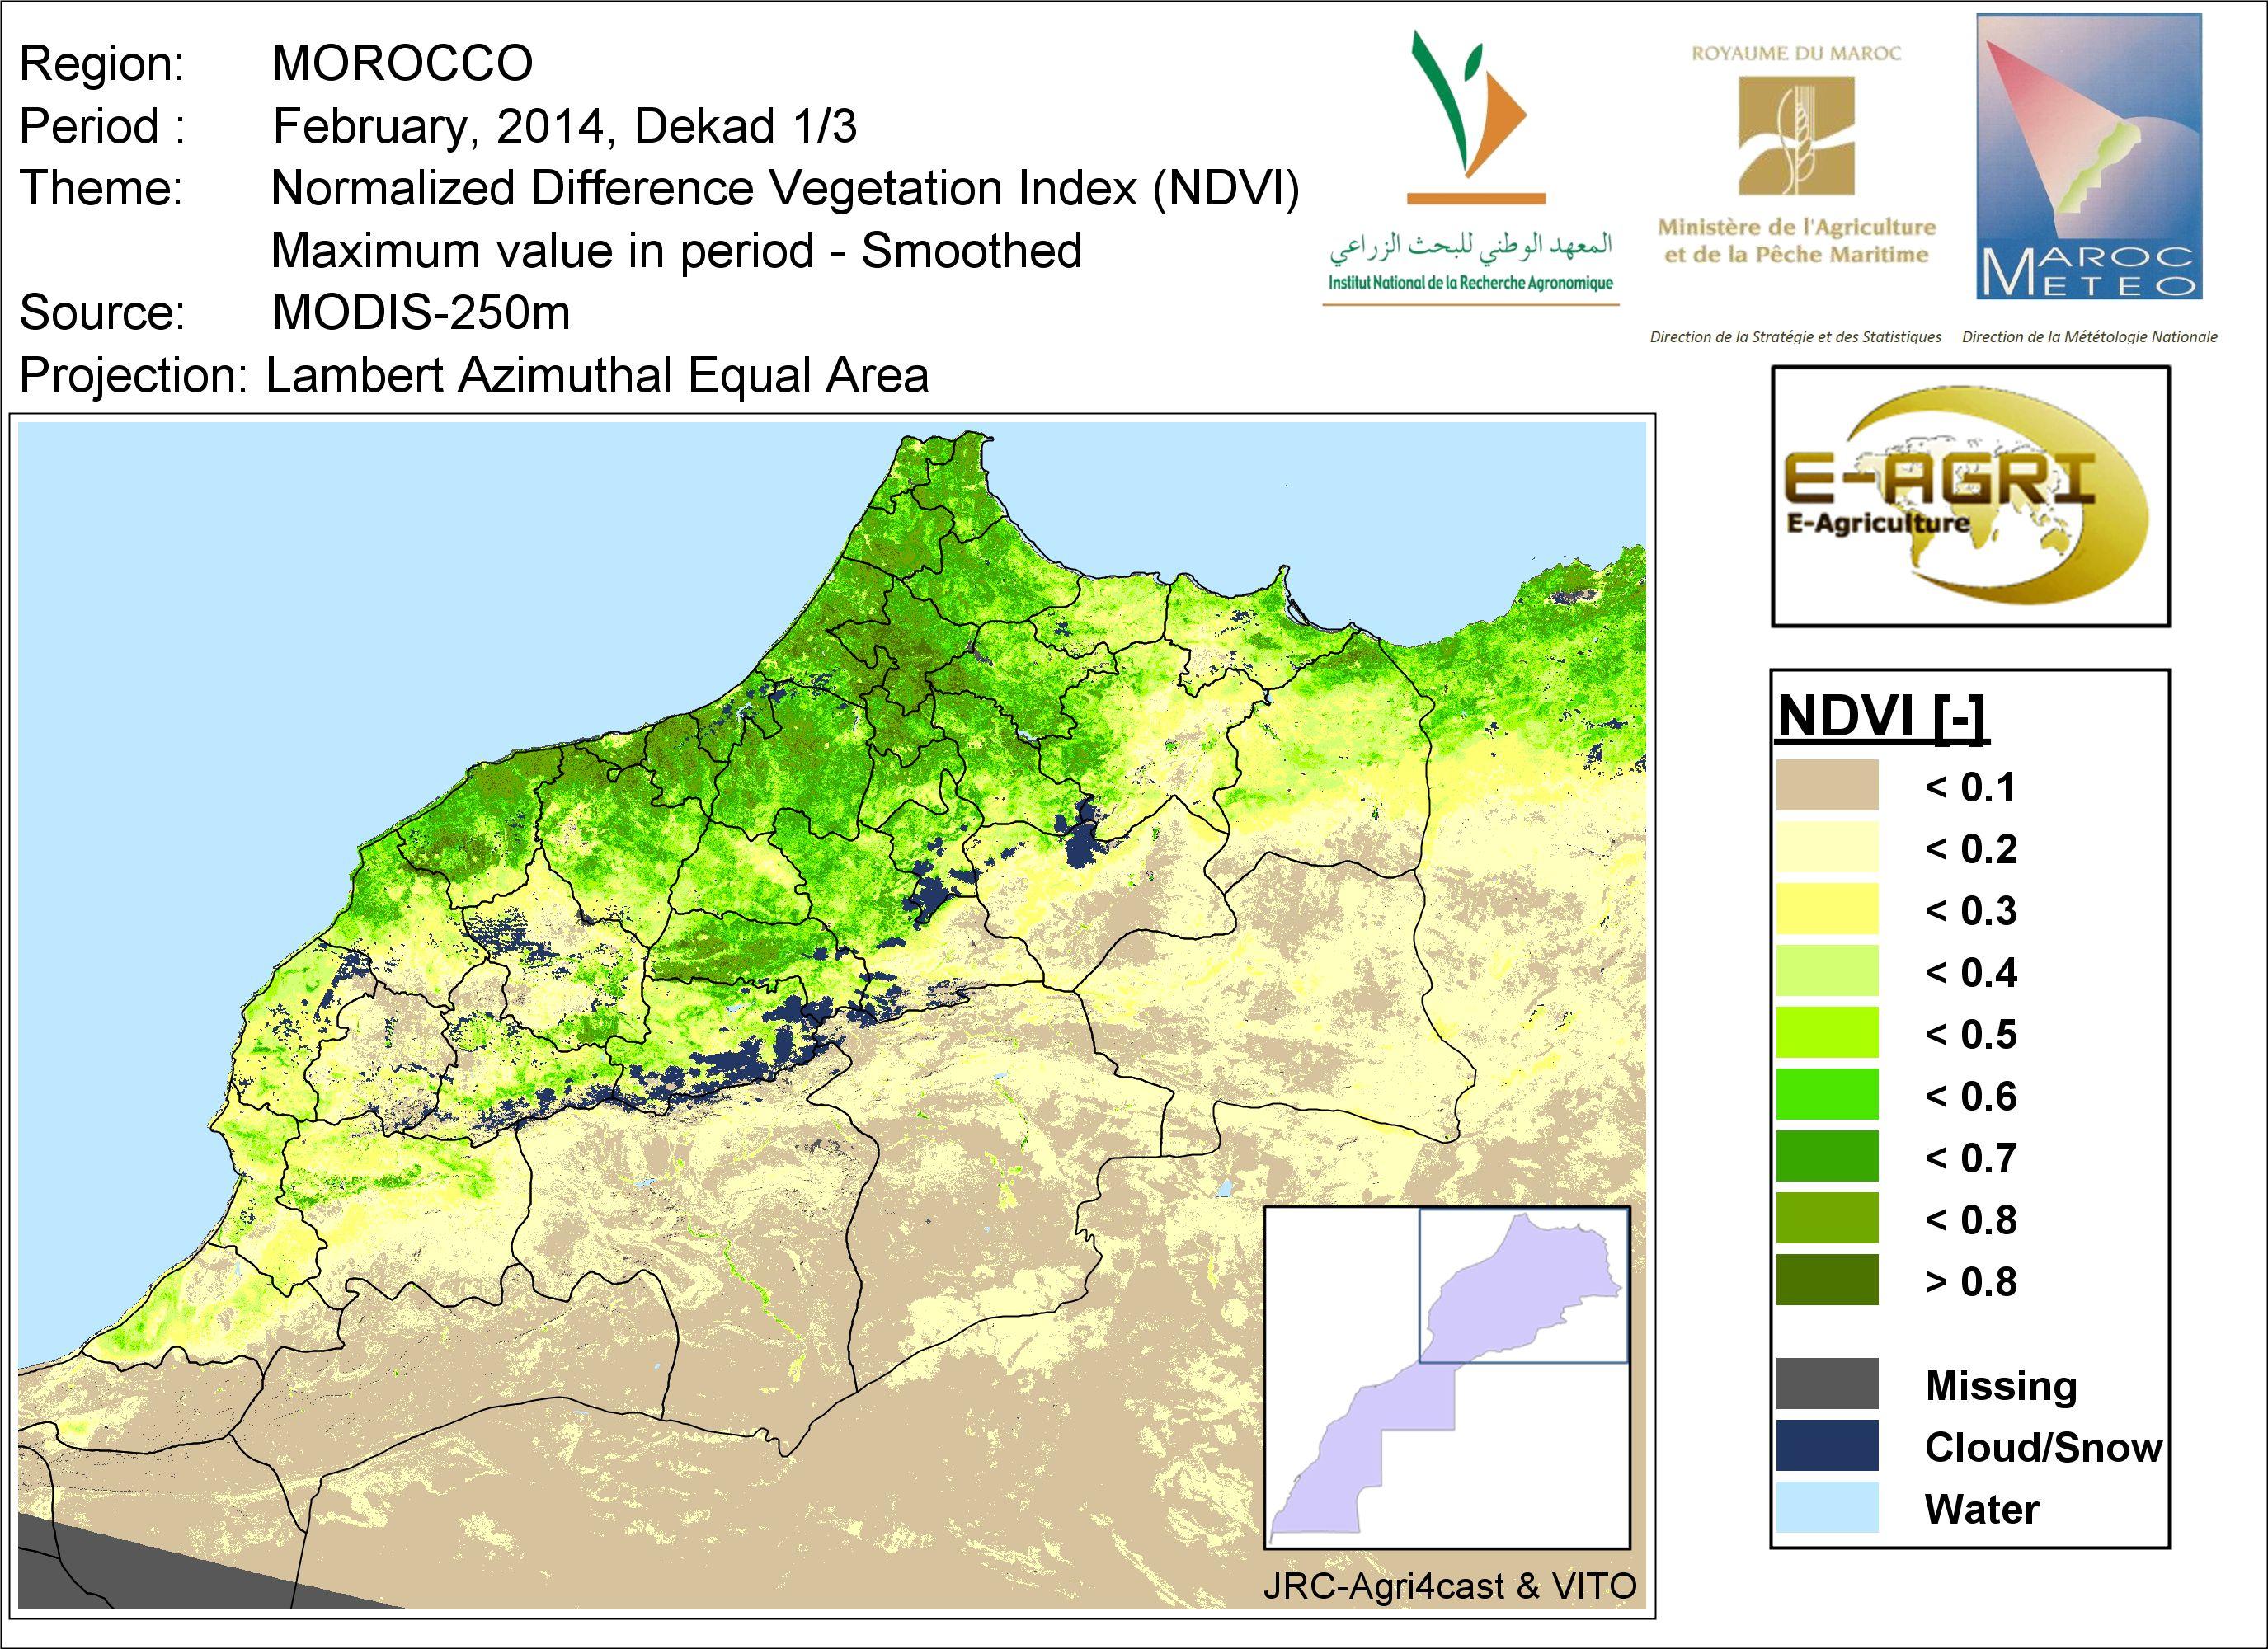 http://www.cgms-maroc.ma/images/ndvi010214.jpg